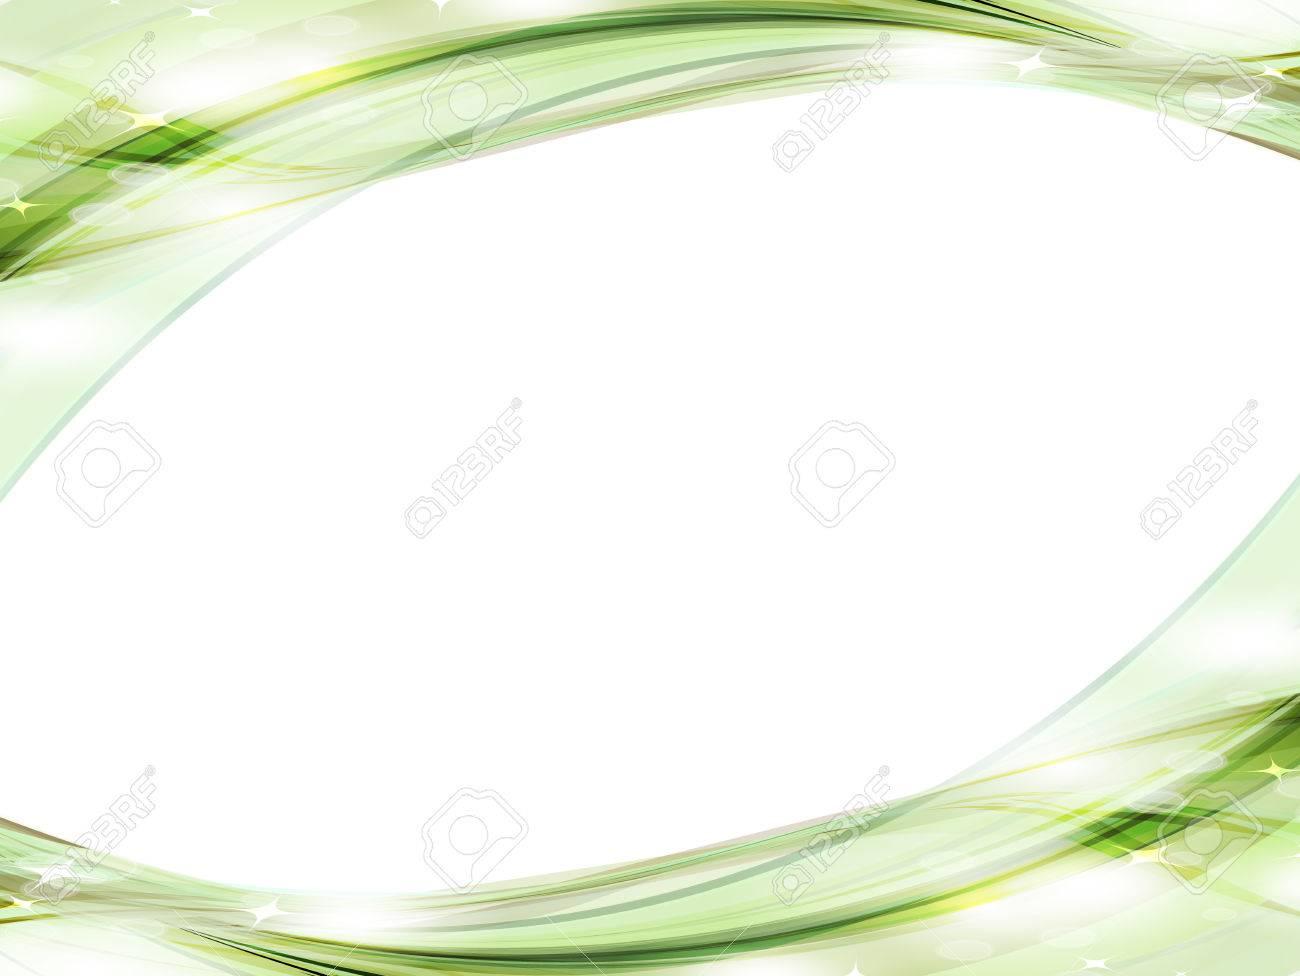 Fresh green green texture background - 52503707